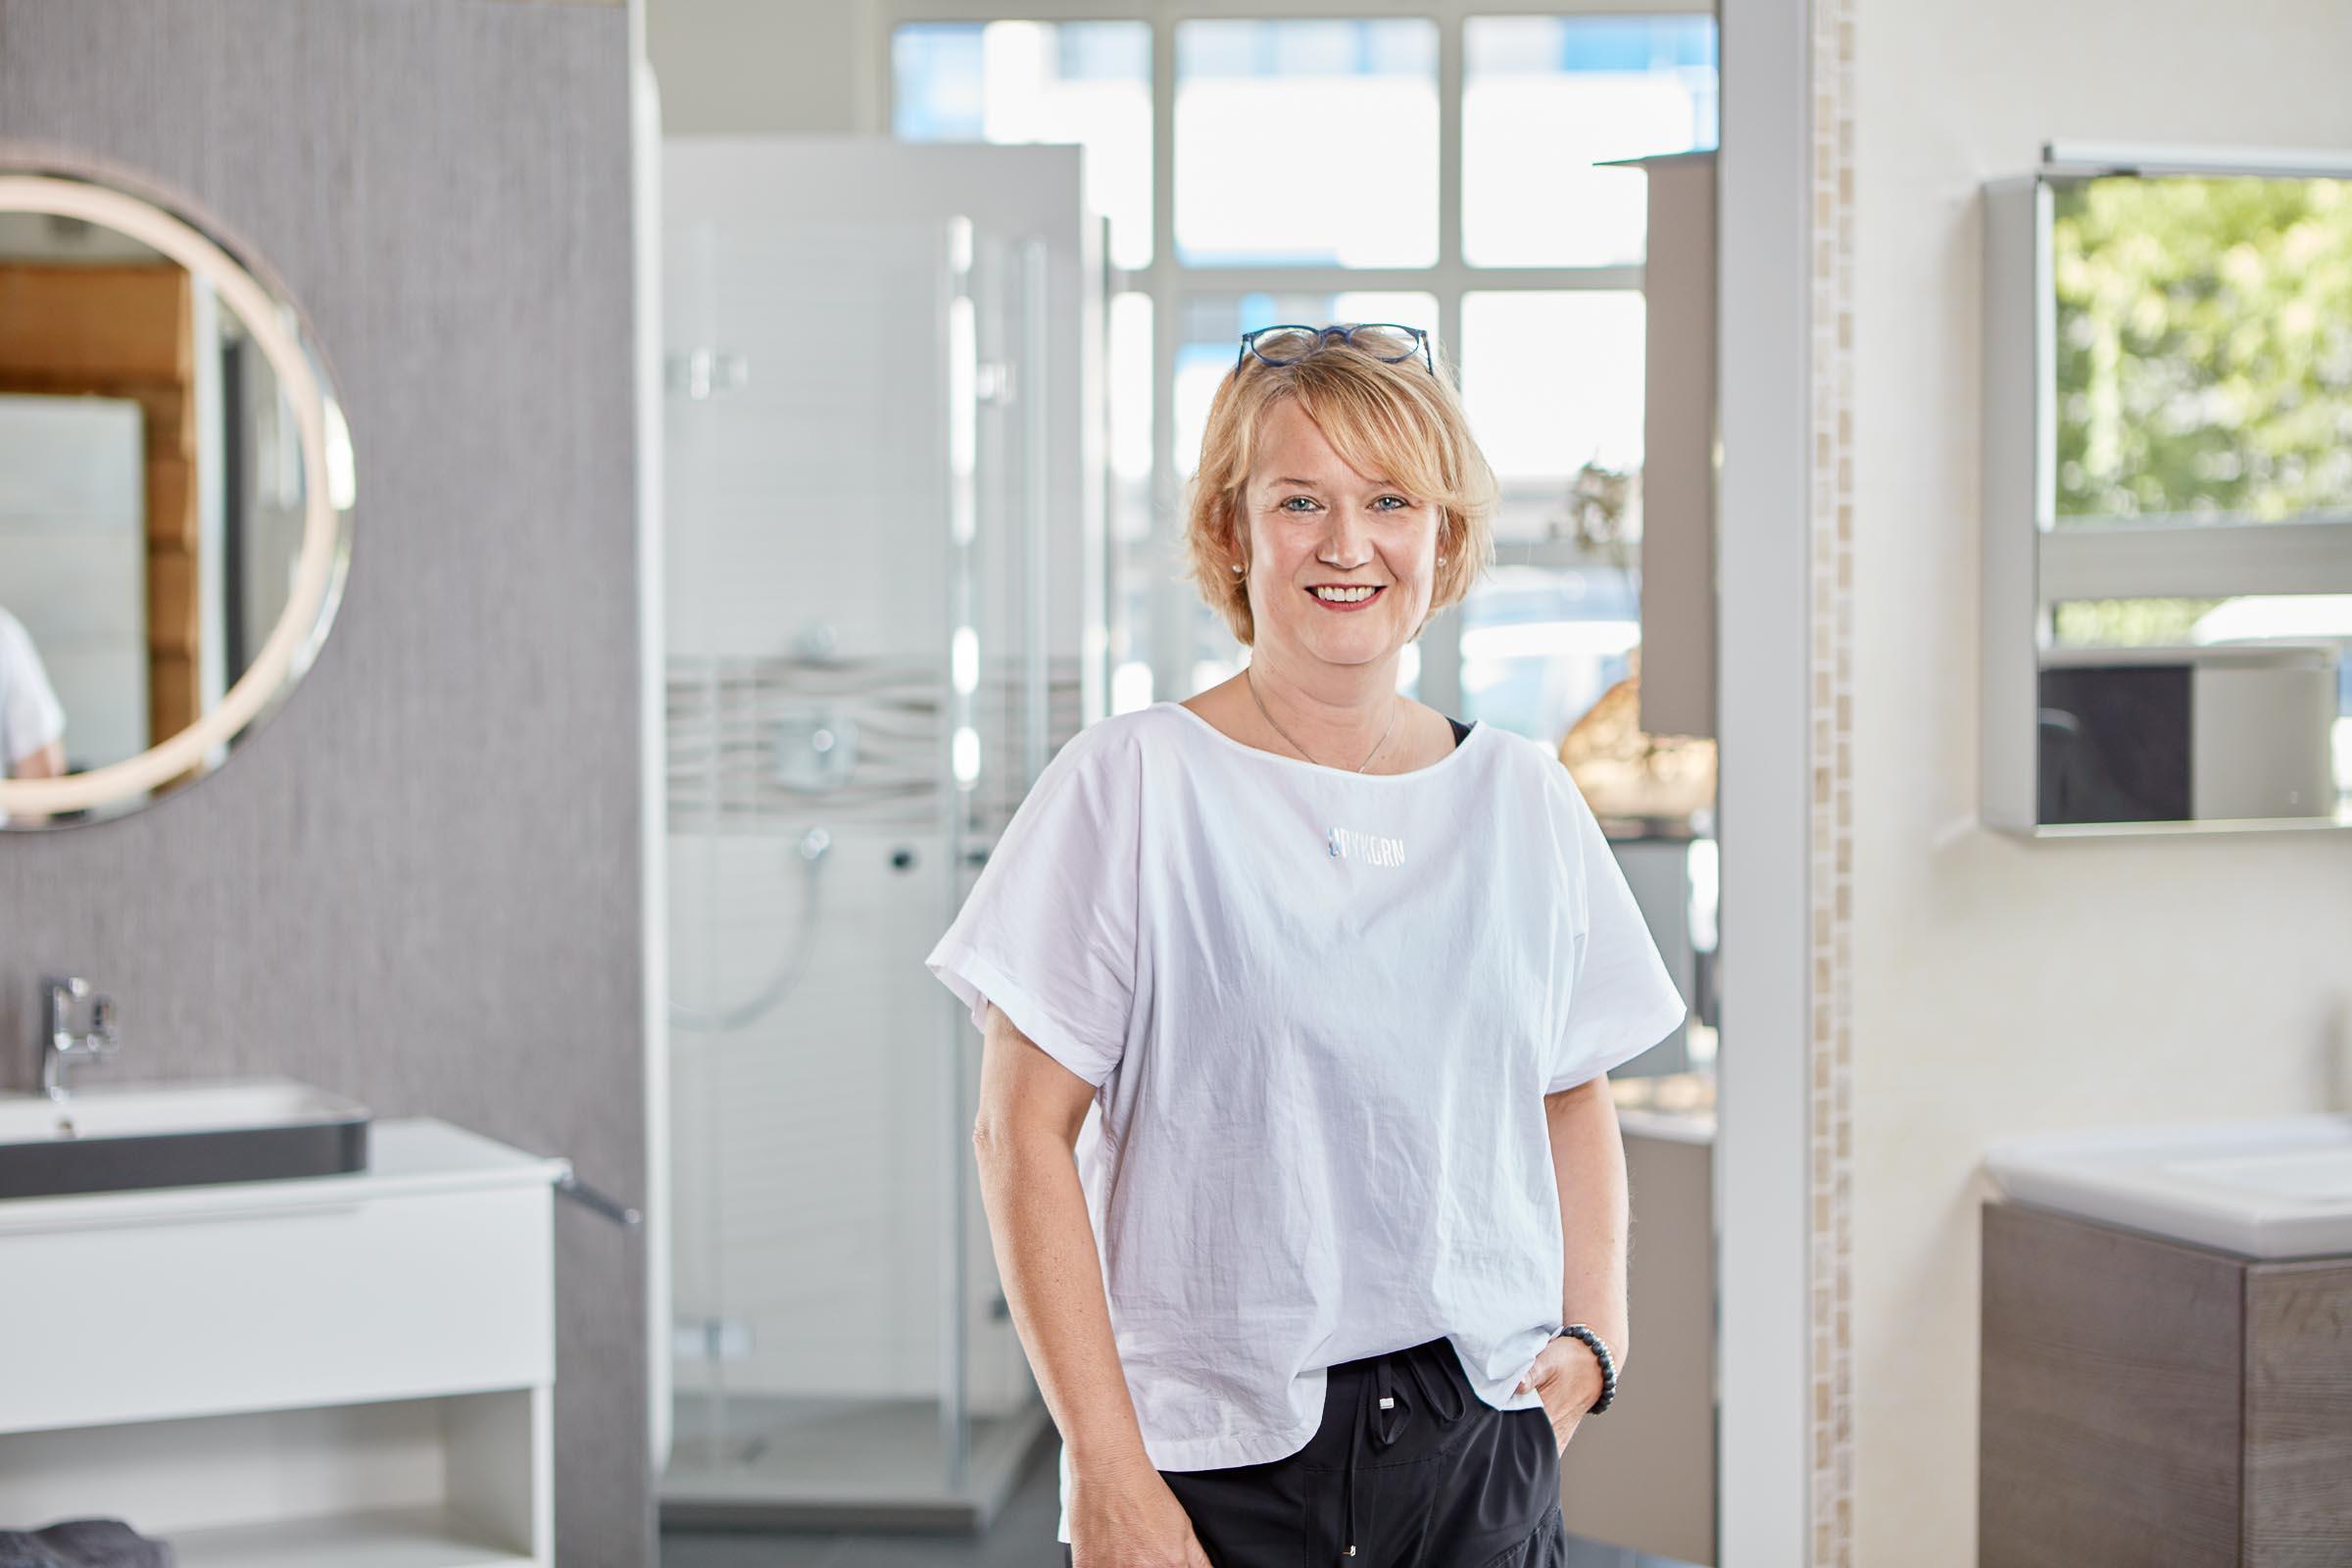 Stefanie Eifer